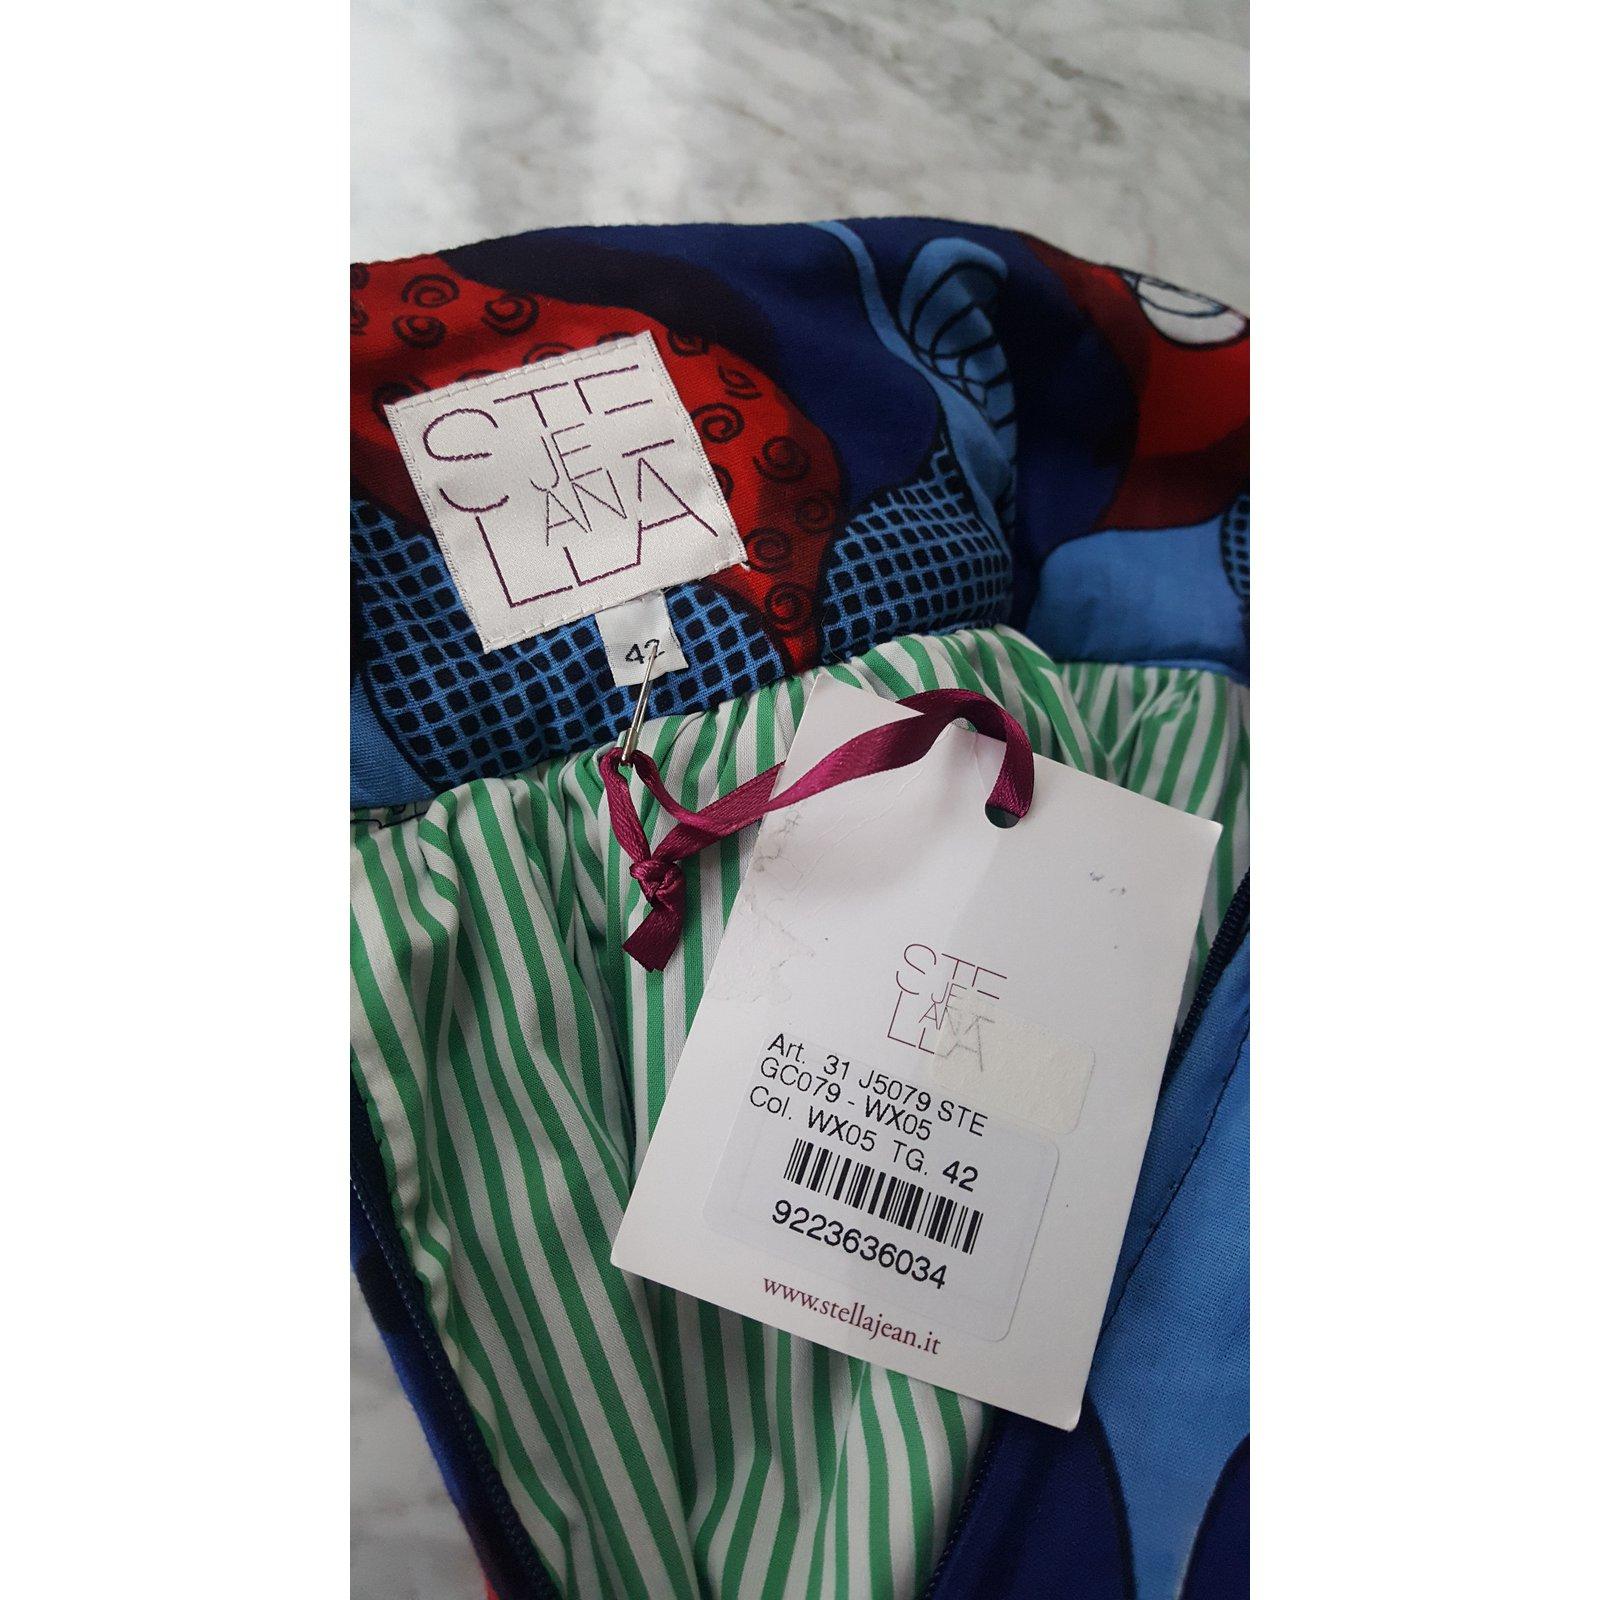 75d6fcd06 Stella Jean STELLA JEAN Blue & Red Cotton Print Skirt 42 IT Skirts Cotton  White,Red,Blue,Navy blue ref.50702 - Joli Closet